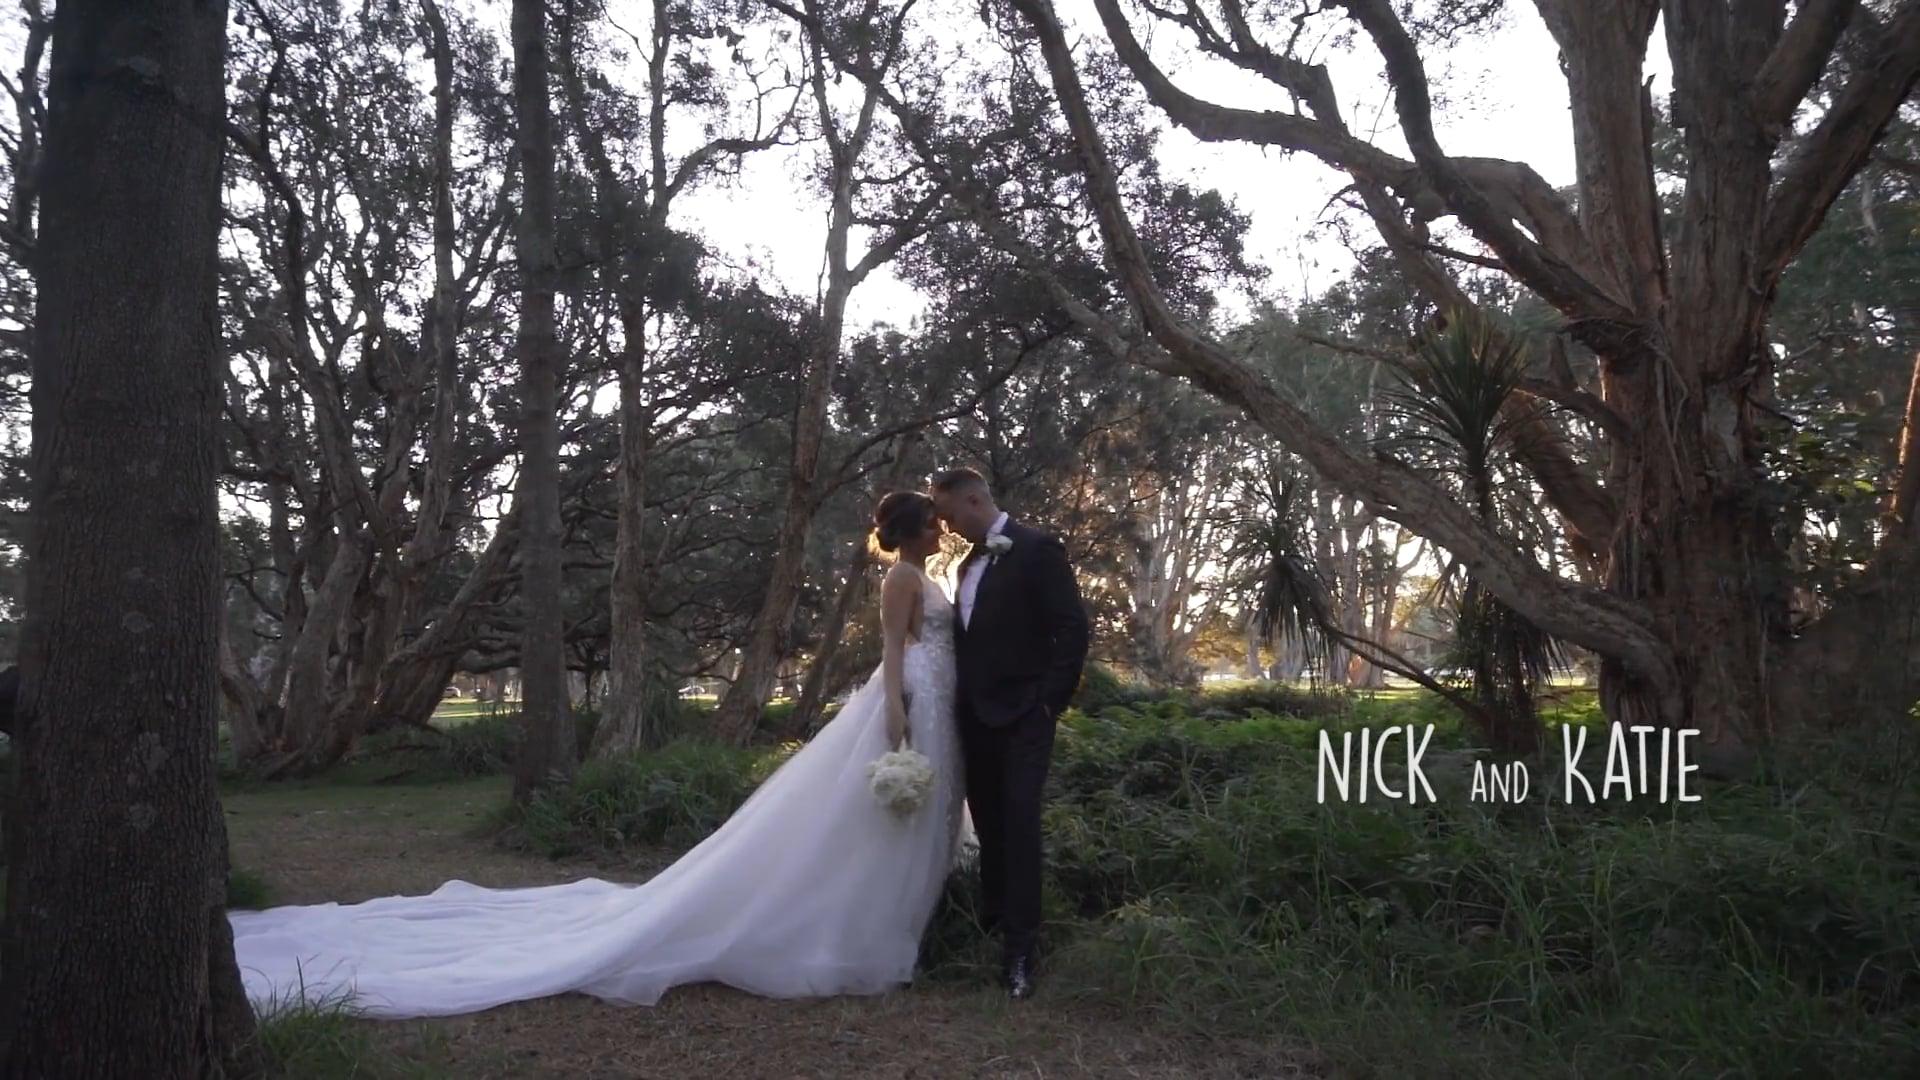 Wedding Cinema Film Highlight | Nicholas and Katie